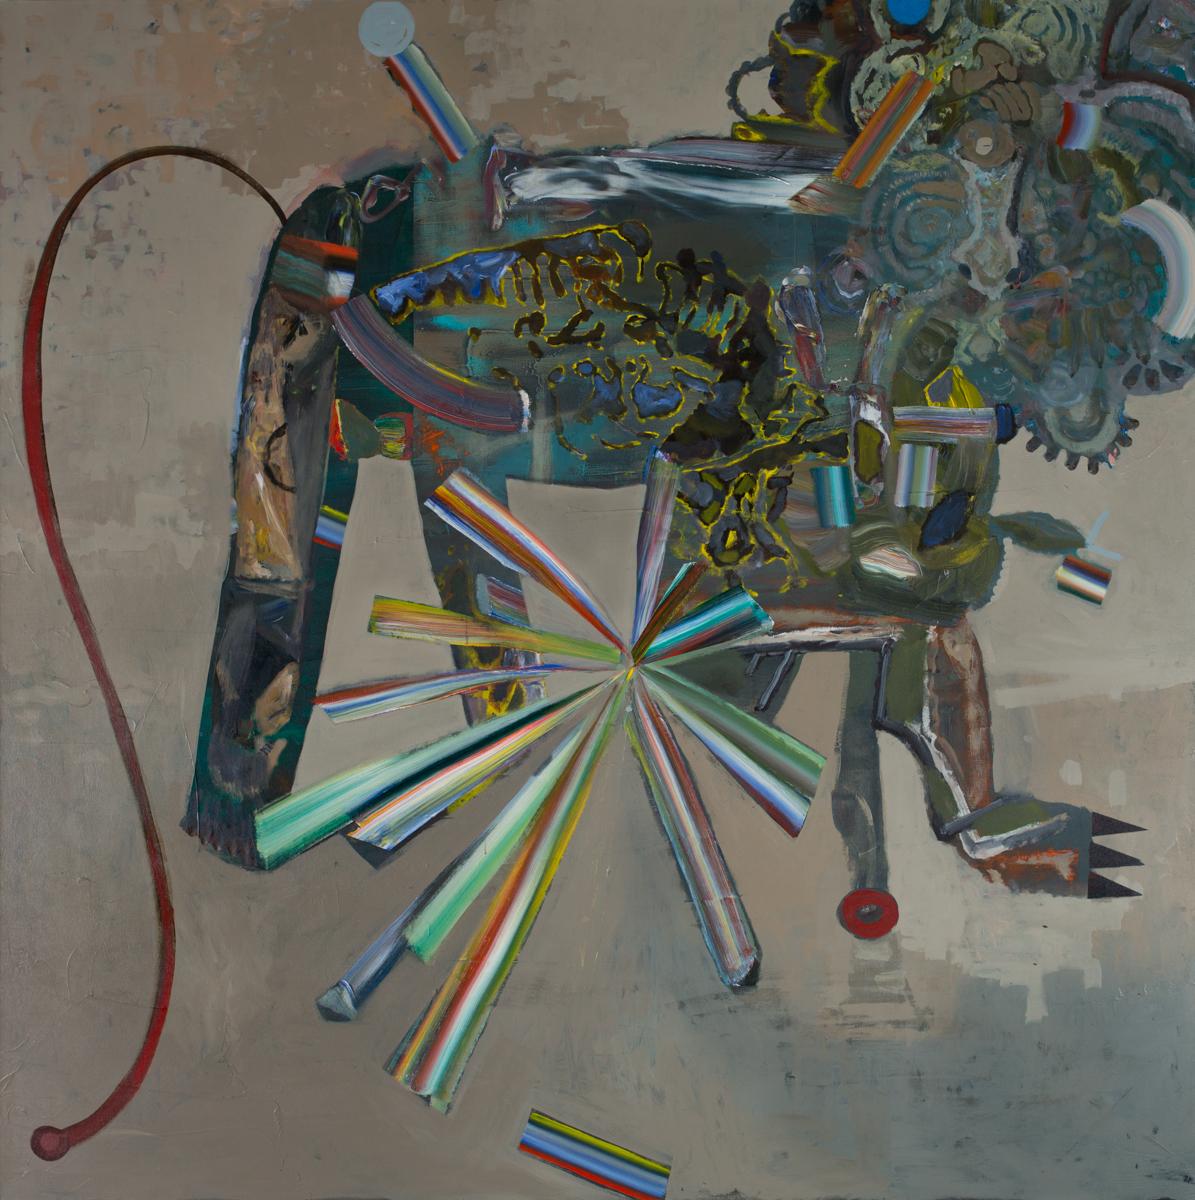 Mixcoatl   Acrylic pigments on Canvas  72 x 72 Inches  2019